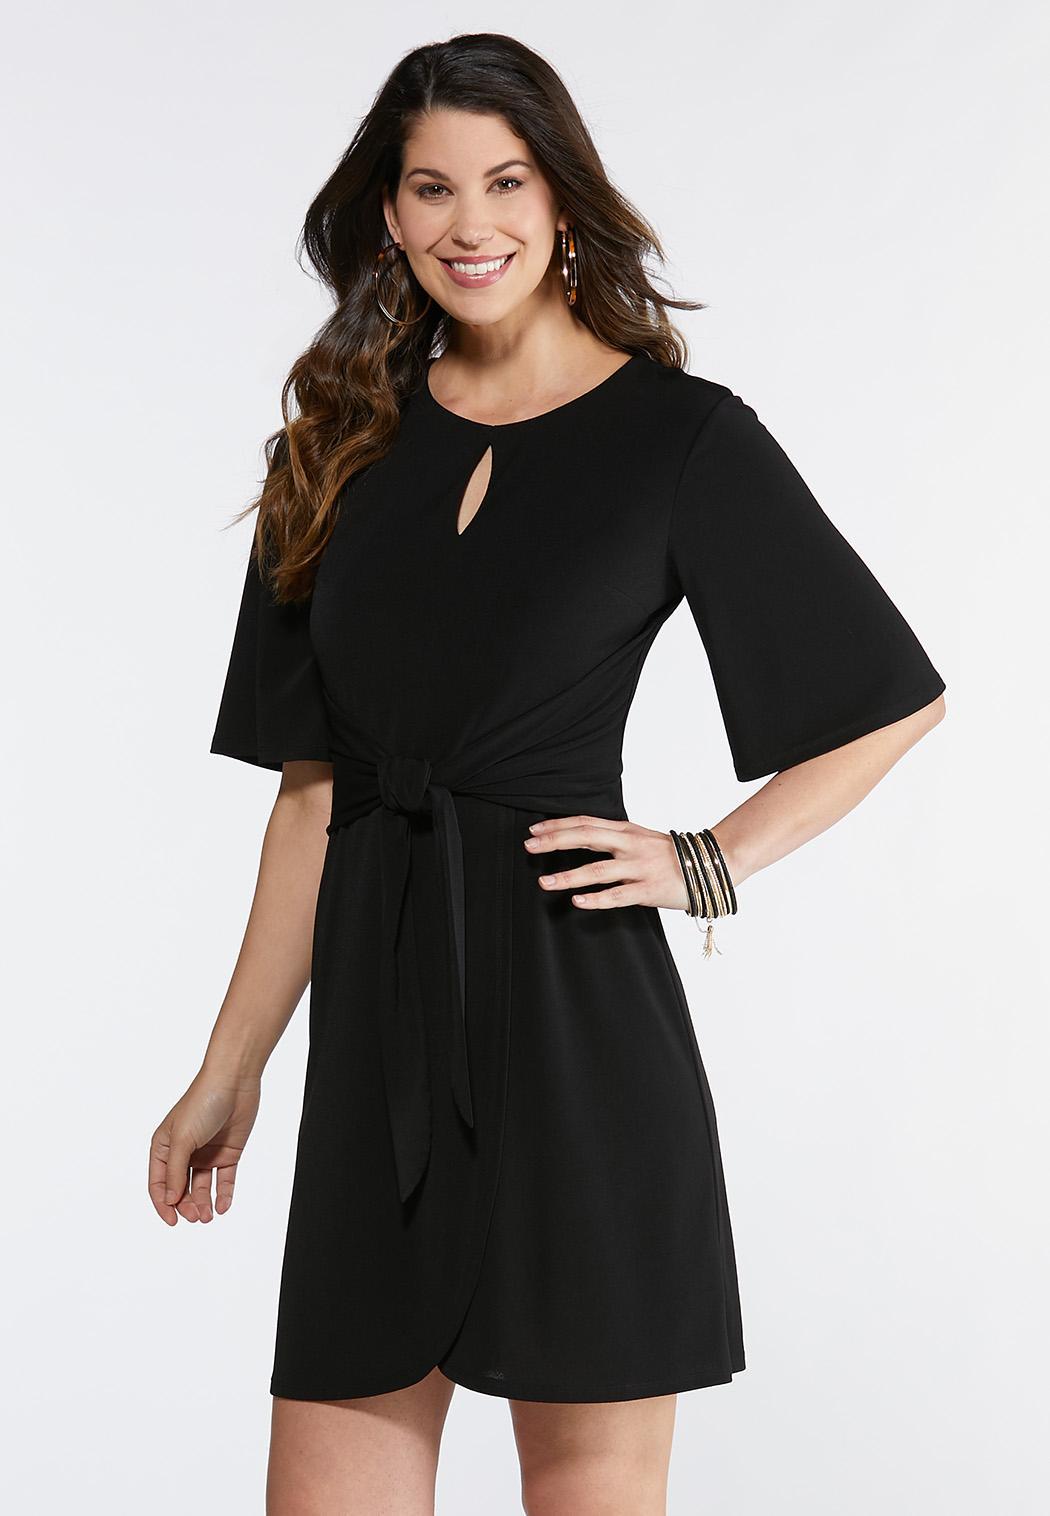 a0f32ce4d Modest Cocktail Dresses For Juniors - raveitsafe